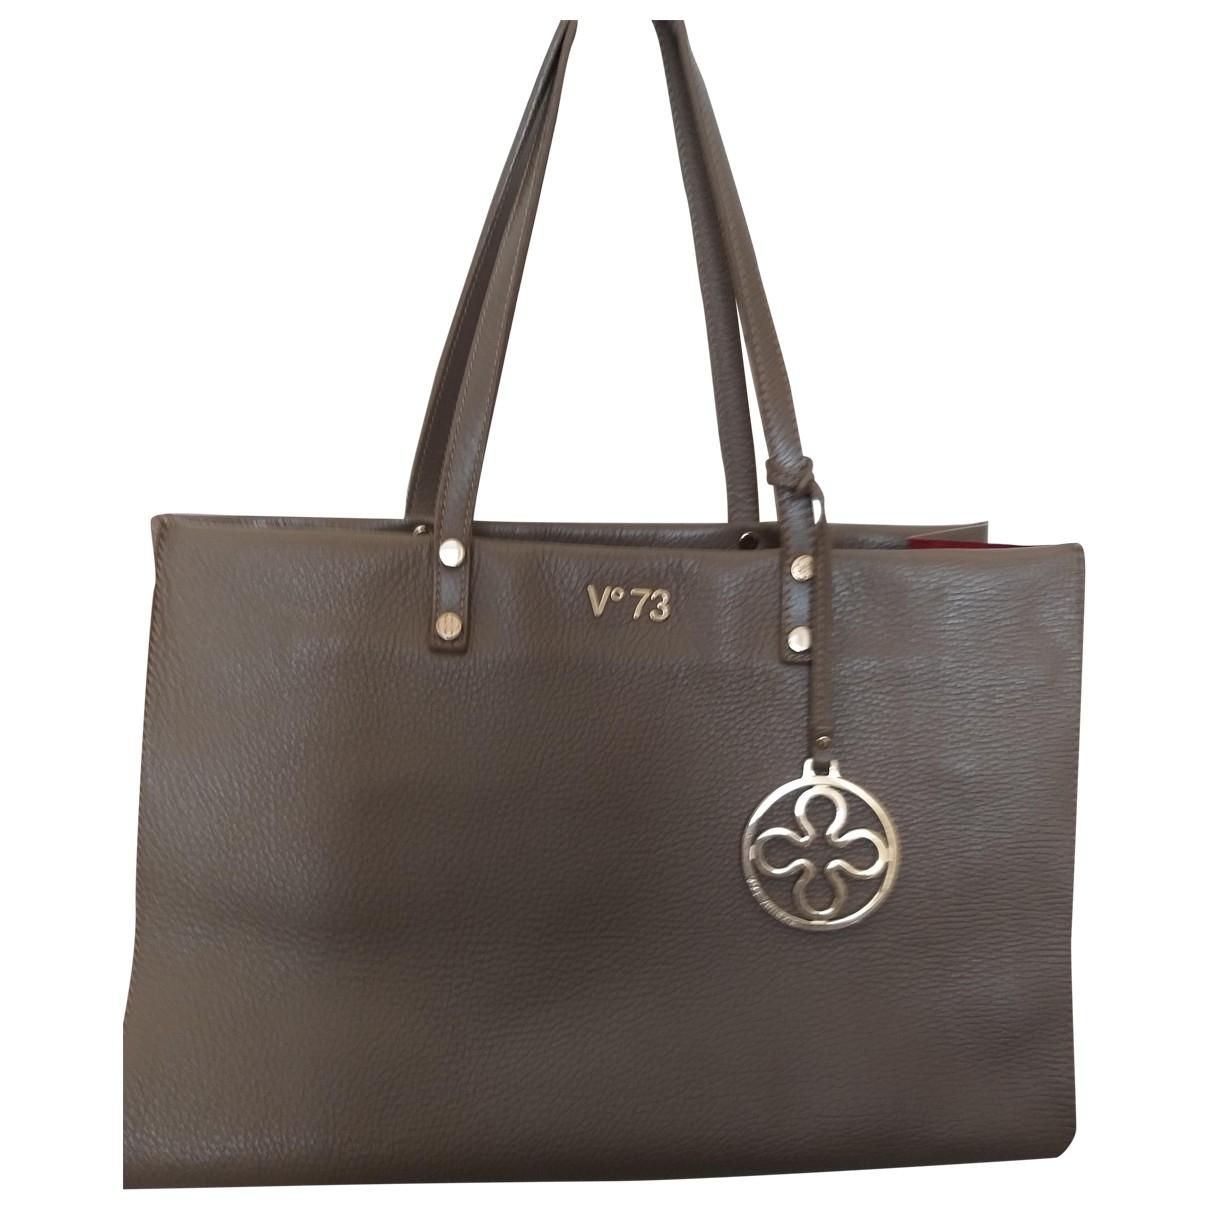 V 73 - Sac a main   pour femme en cuir